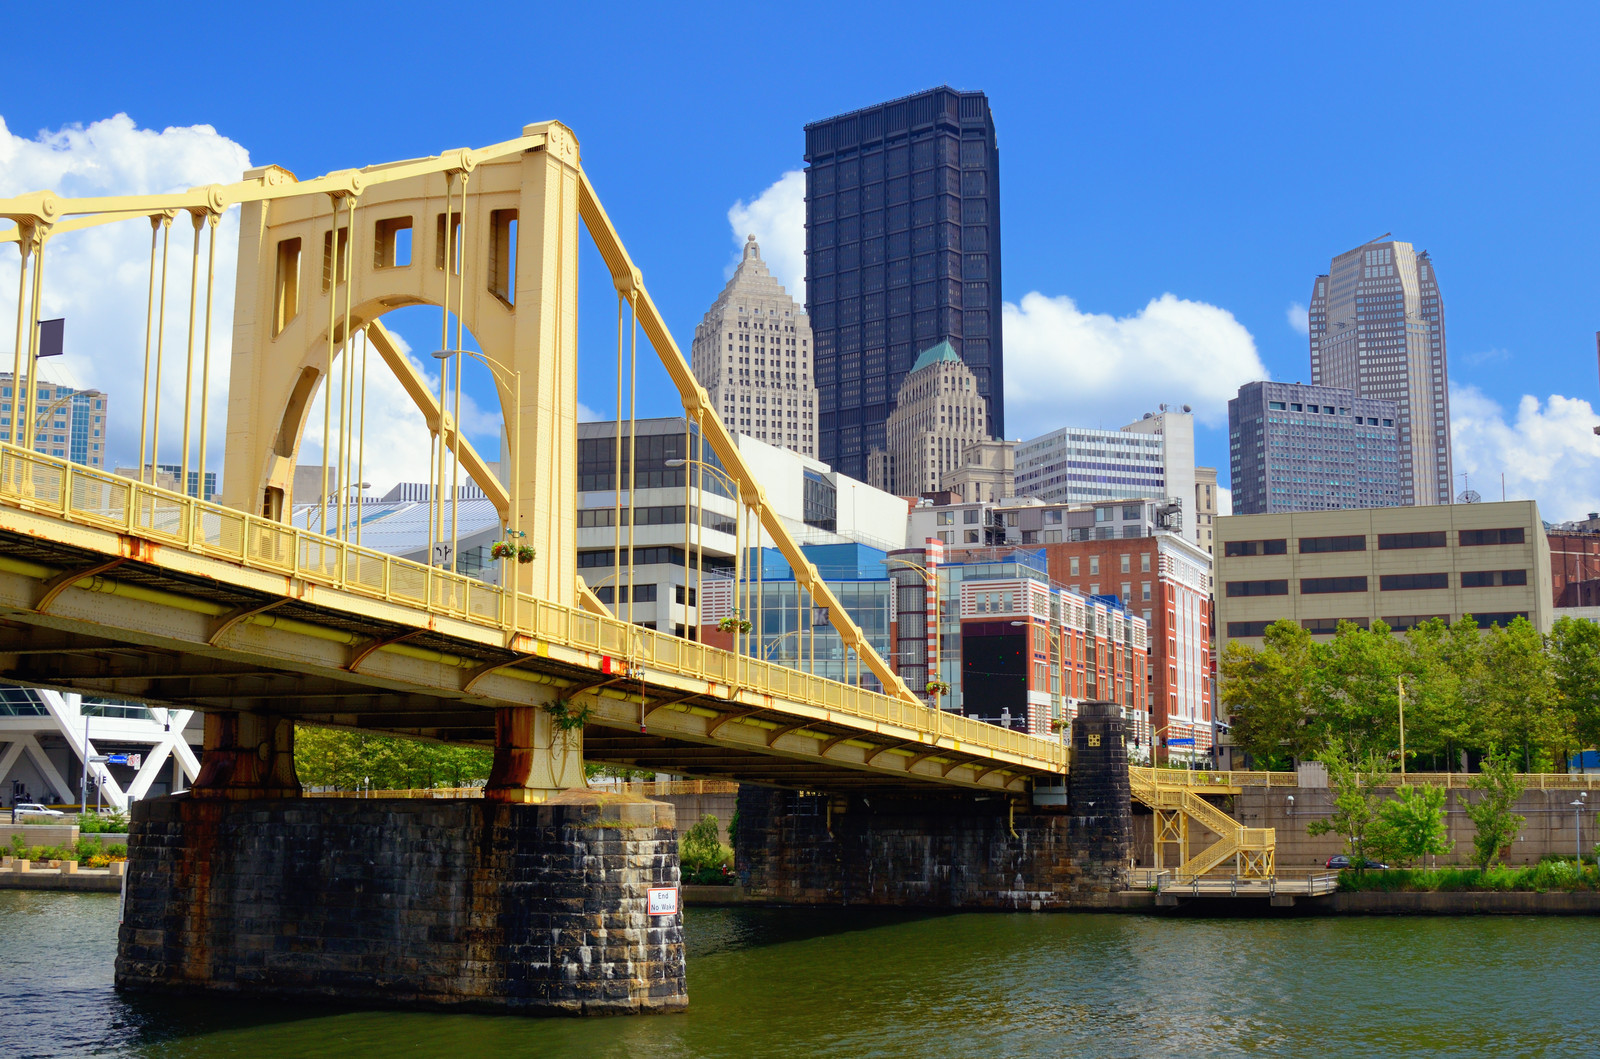 Pittsburgh, PA - Home of SpiralGen